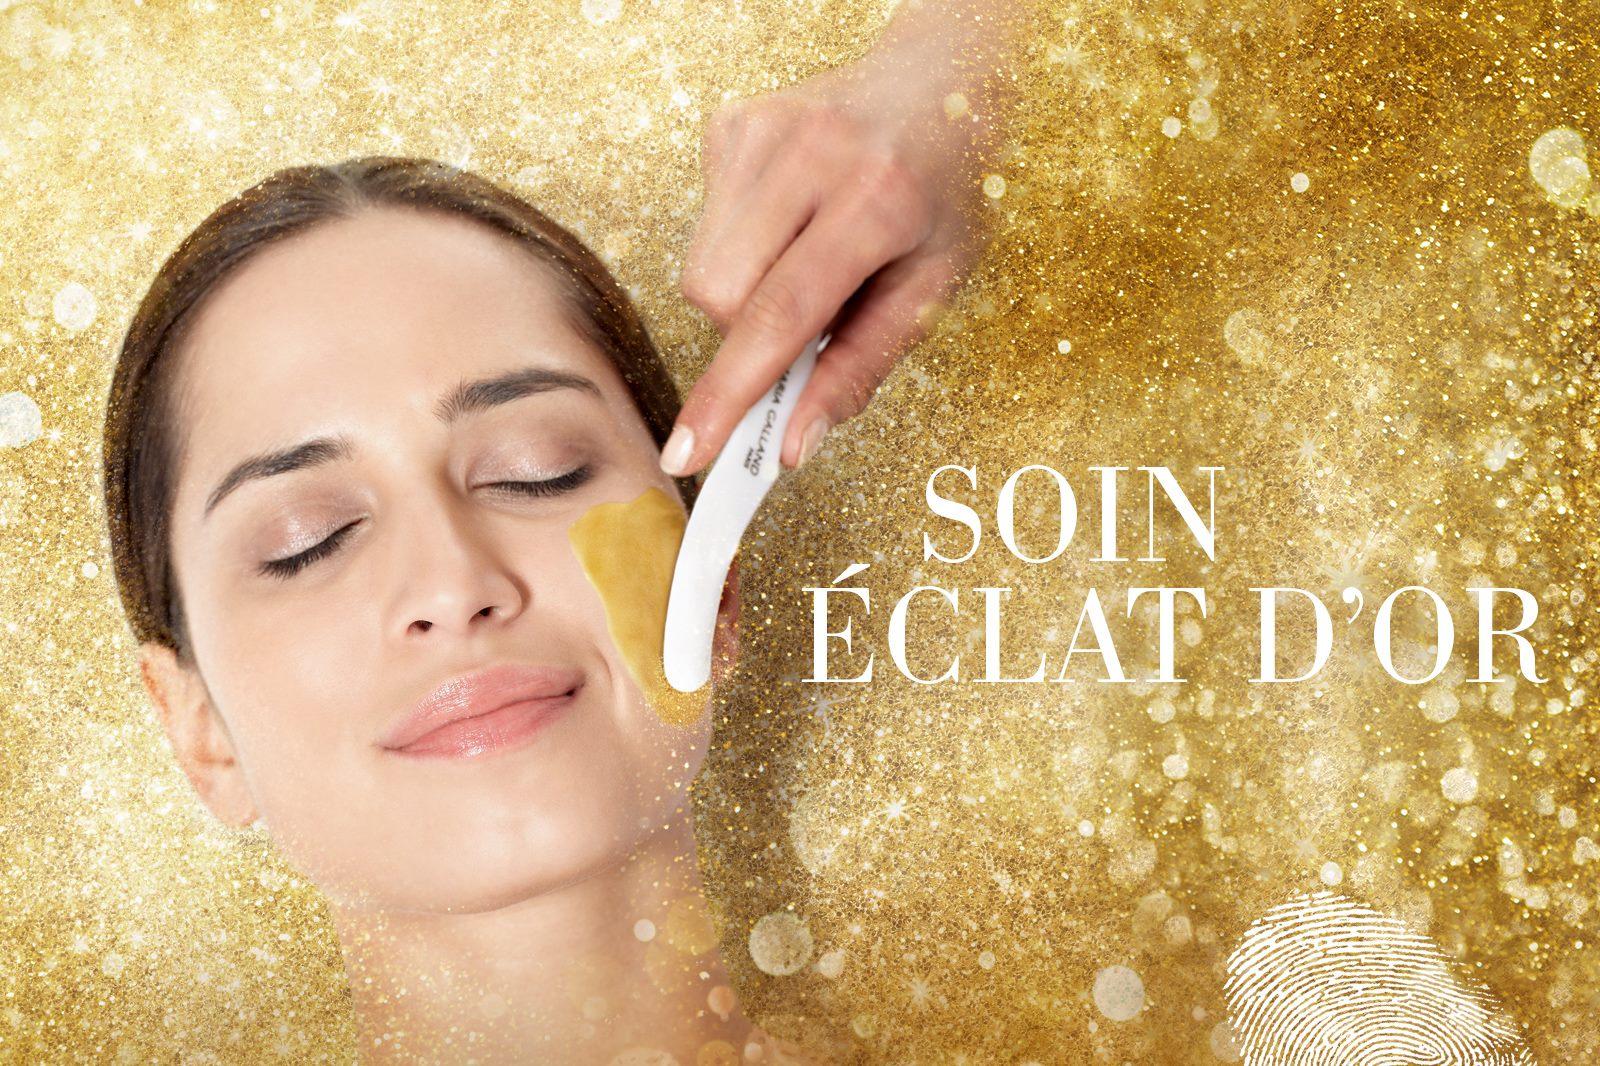 Soin Éclat D'or María Galland - Tratamiento facial con oro